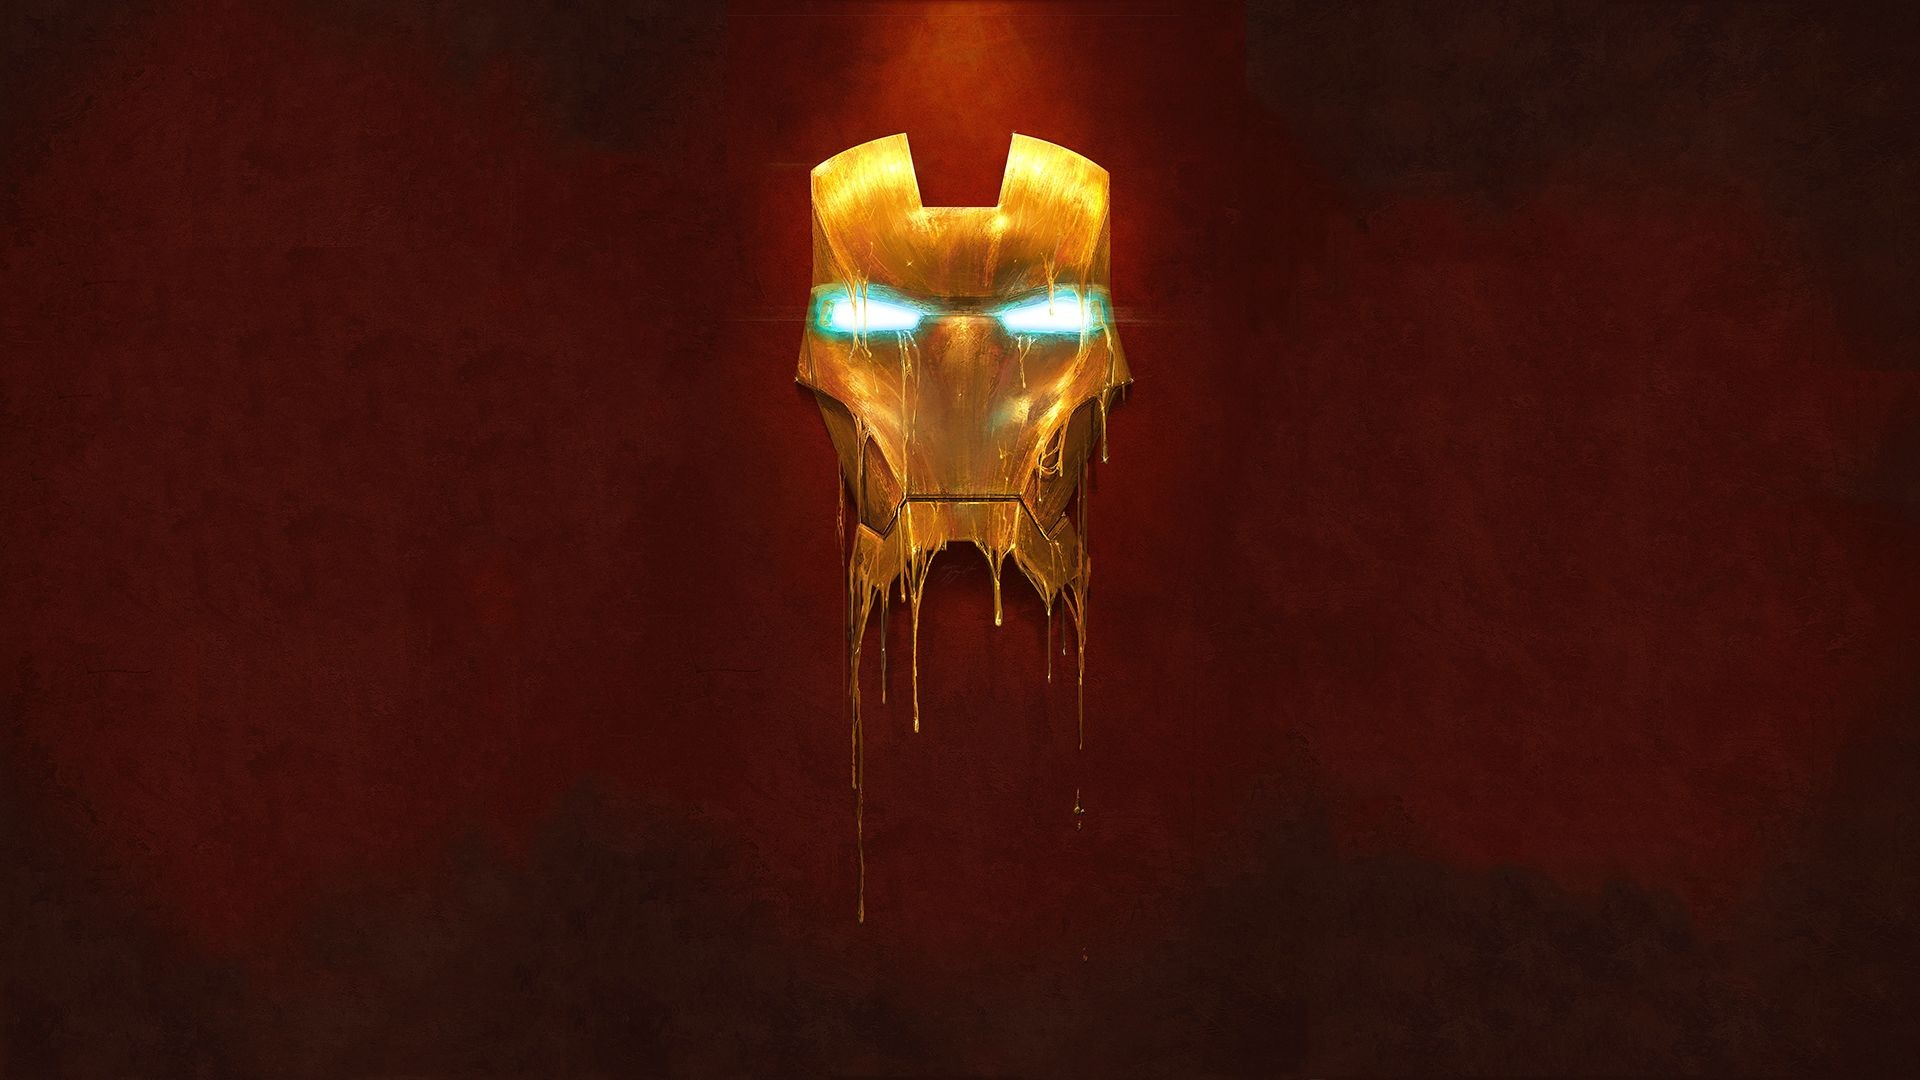 Iron Man HD Wallpaper Background Image